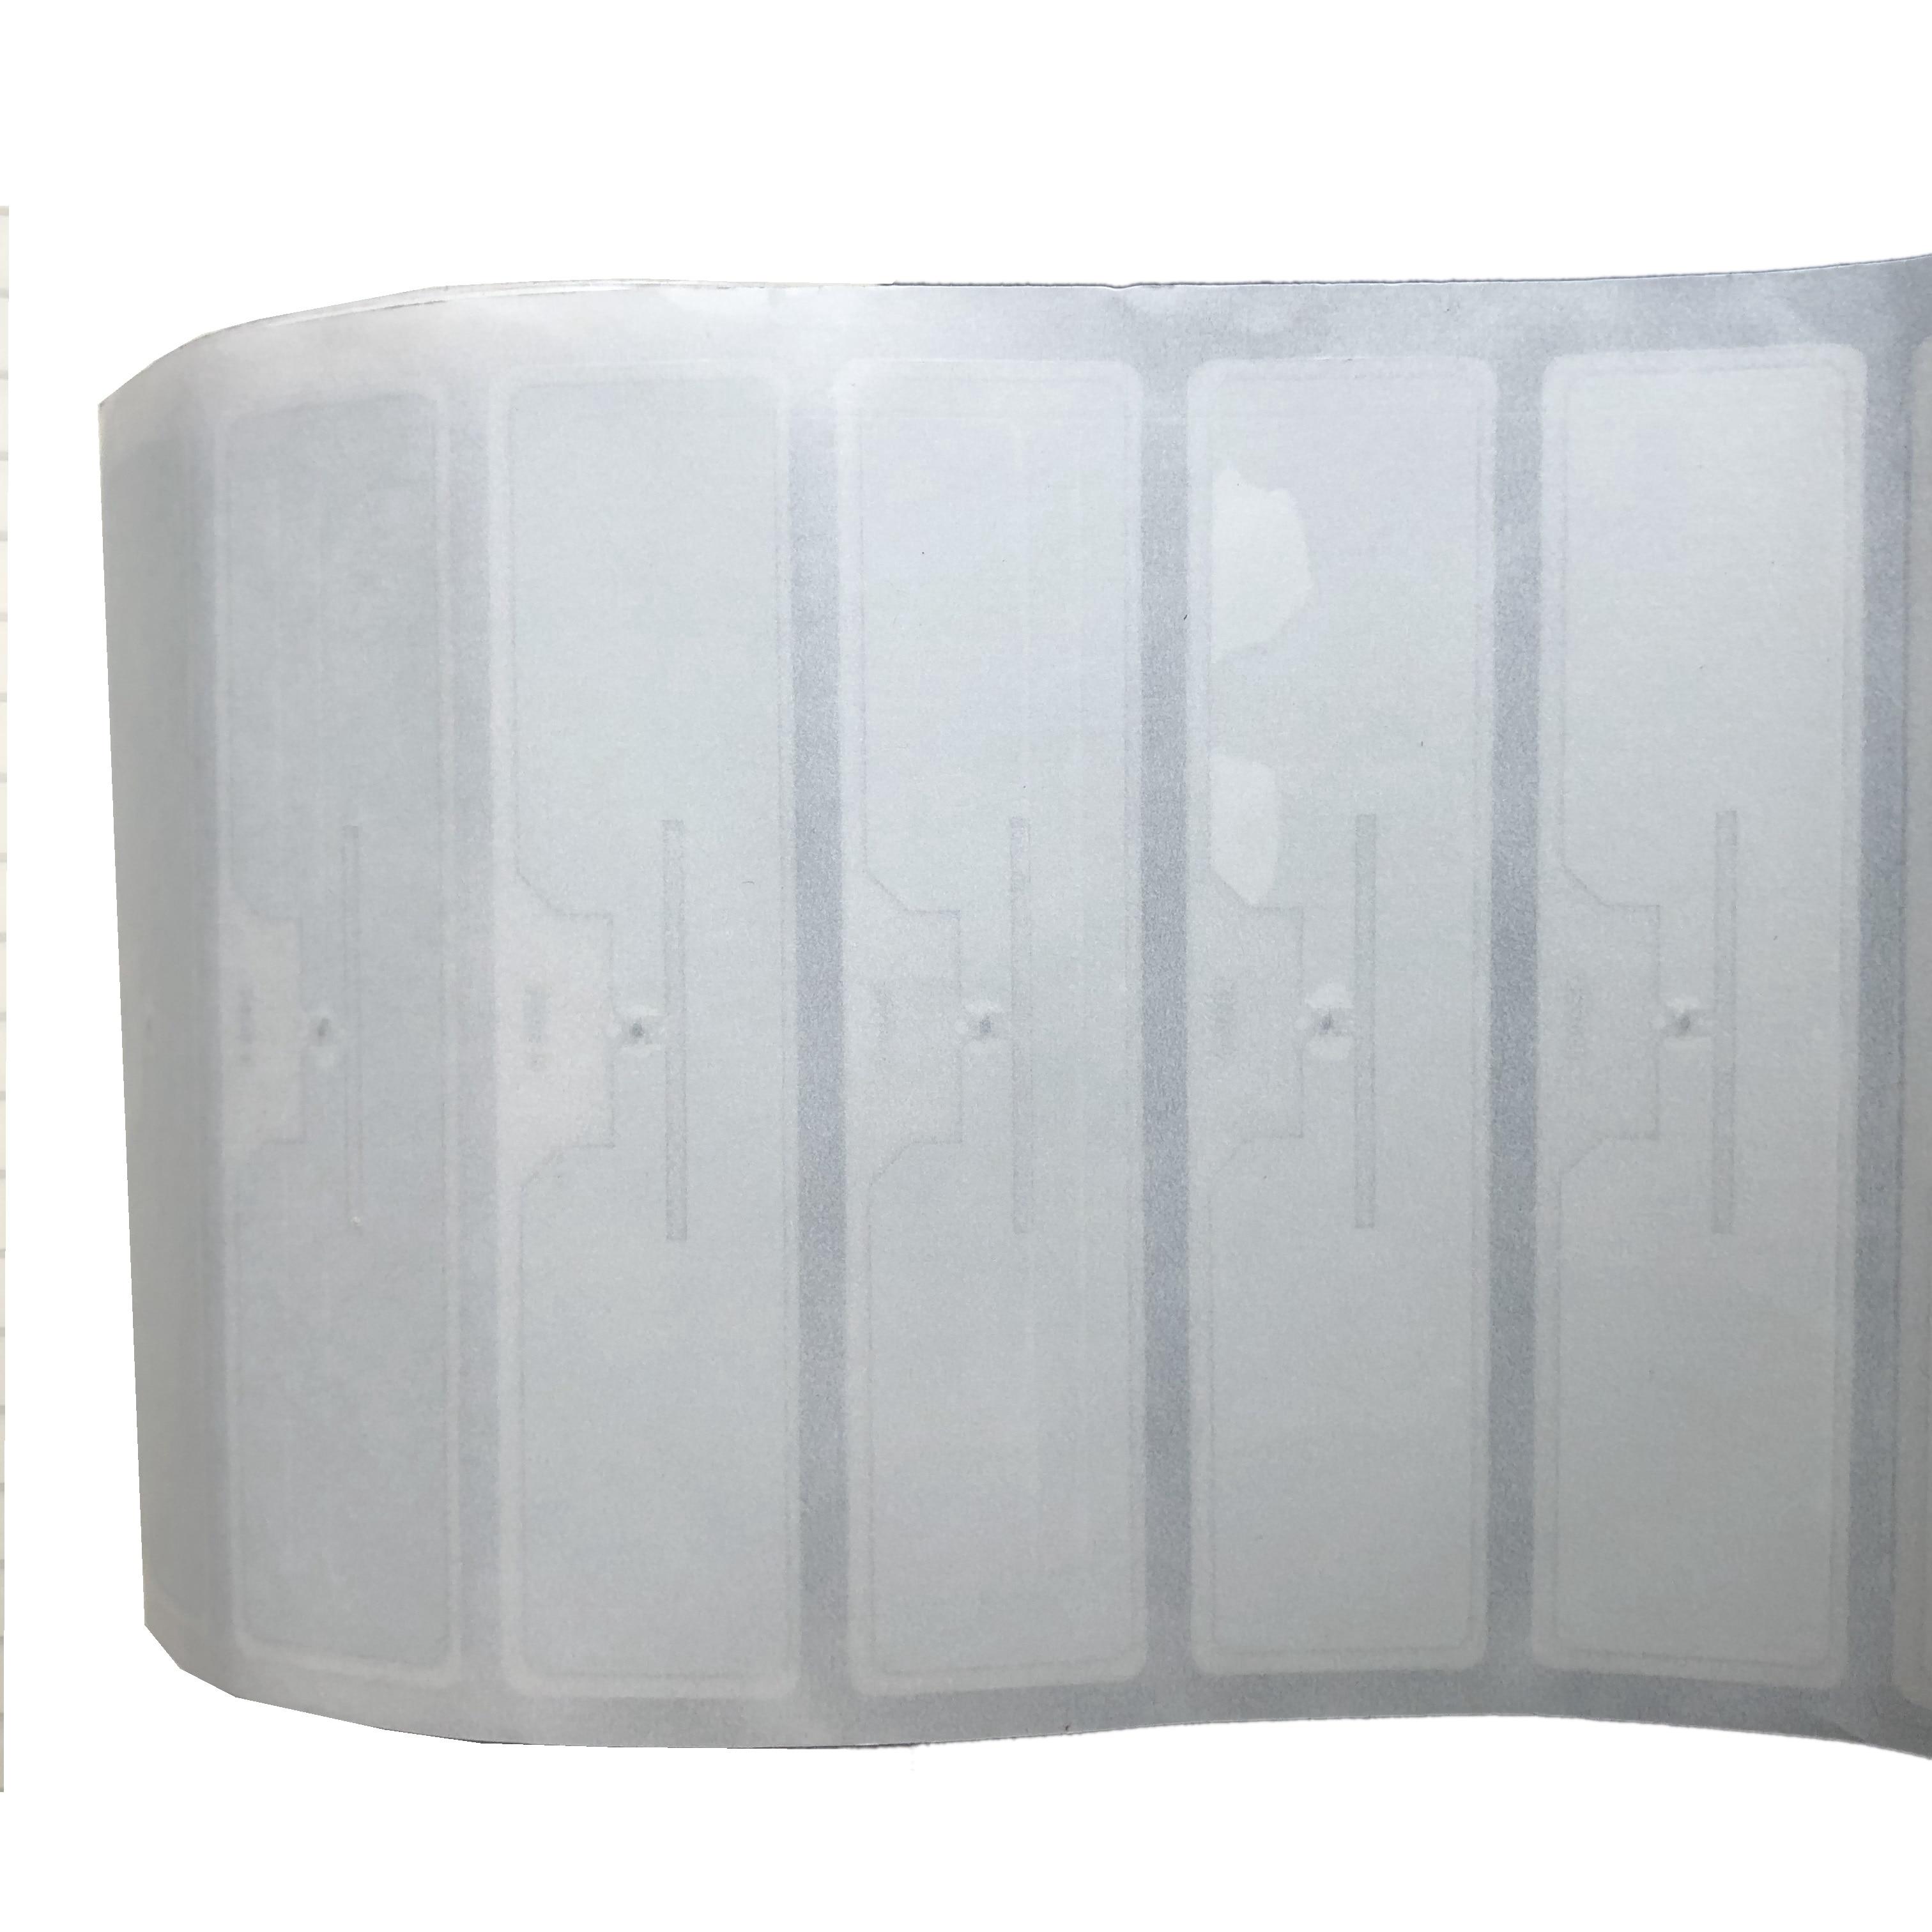 1000PCS UHF RFID Tag 9654 H3 Chip ISO18000-6C 915MHz Passive RFID UHF Sticker Label